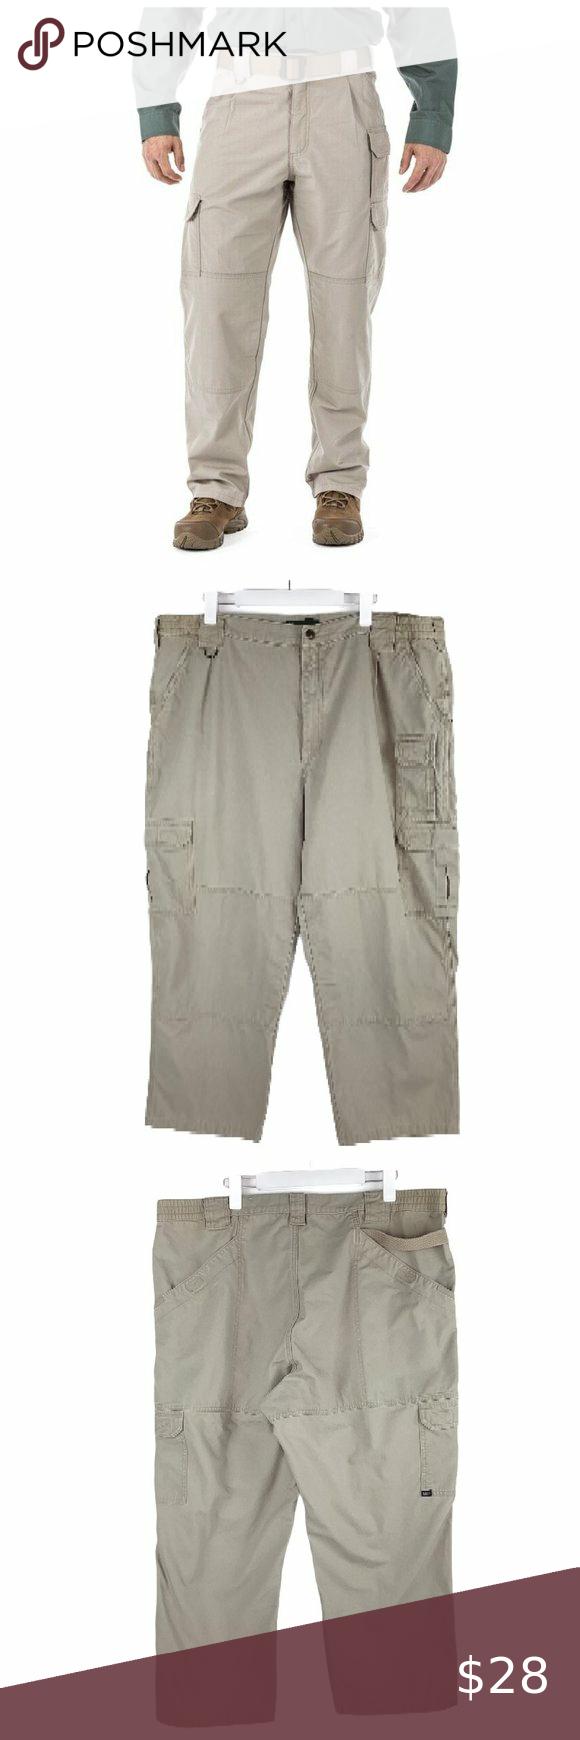 5.11 Women/'s Tactical Pants 100/% Cotton Khaki NWT Size 6